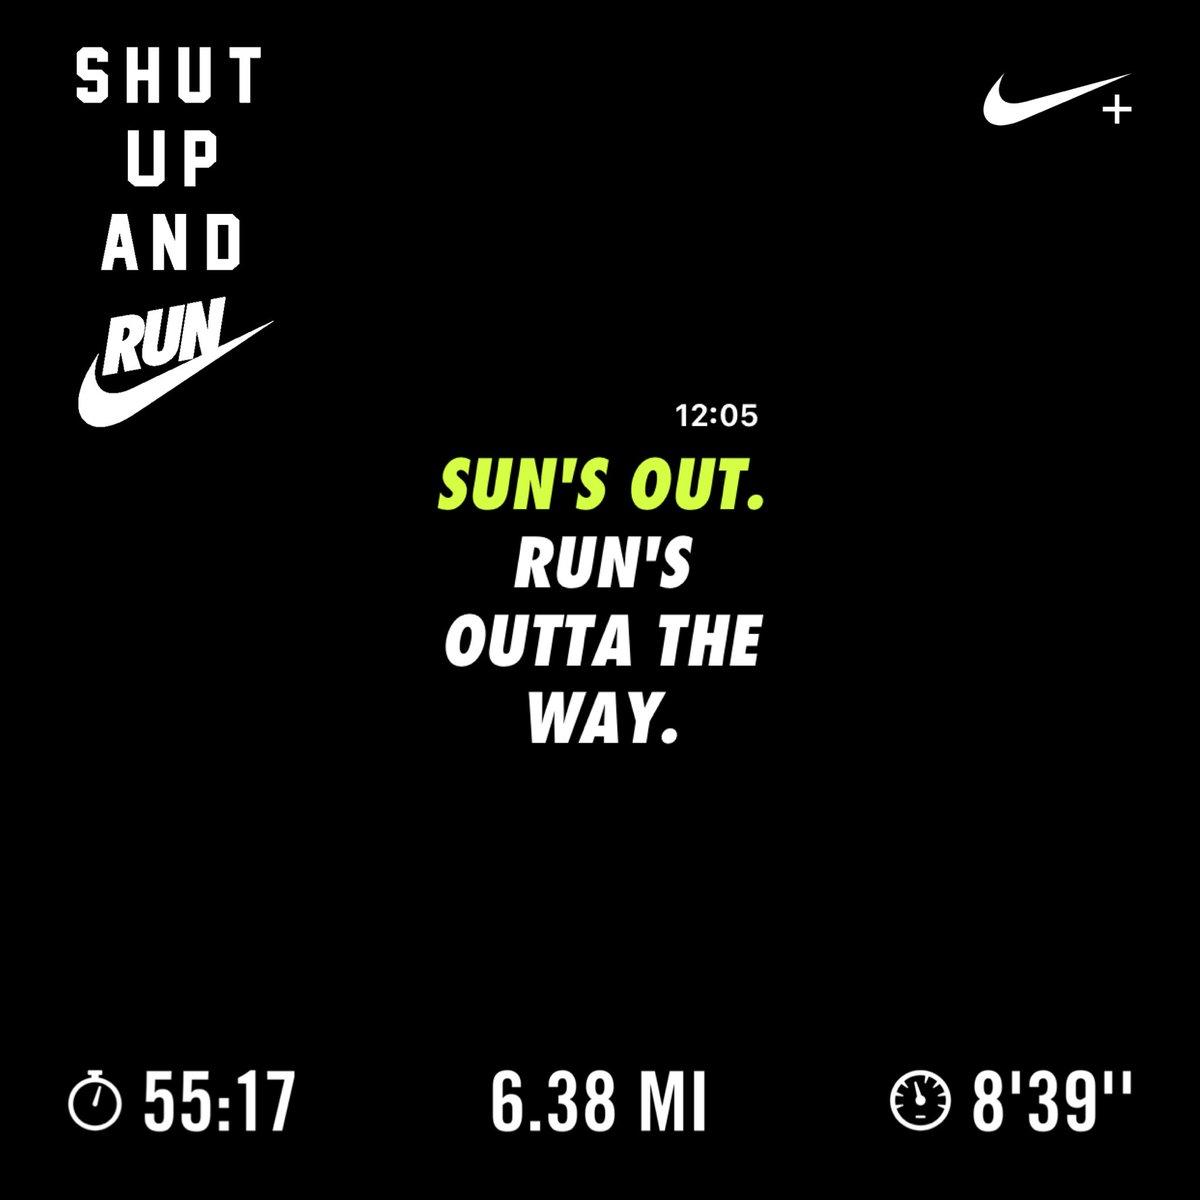 2/28/2020 - TGIF  Every run has a purpose.   #RunMcKinney #RunTexas #instarunners #justdoit #nrc #nikerunning #nikerunningclub #allineedisonemile #RunWithHCM @nikerunning @teamnike #RunTheYear #2020in2020pic.twitter.com/sgRVq0I3ob